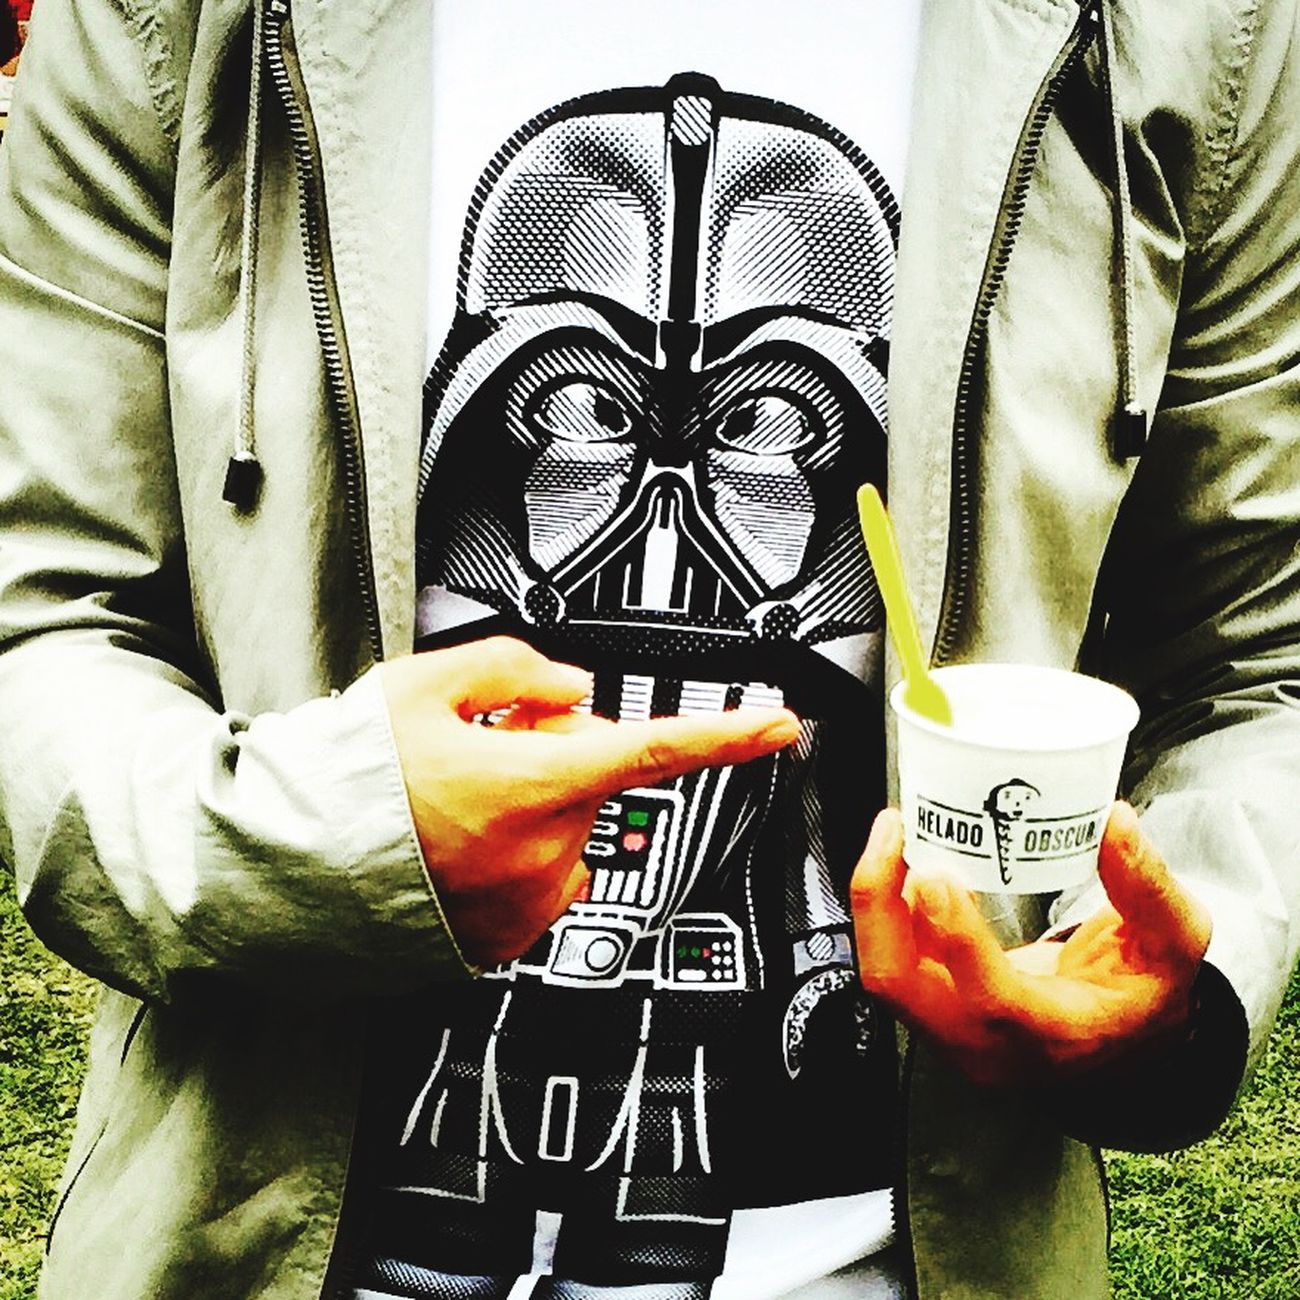 Helado obscuro entienden? Badumtsss MayThe4thBeWithYou Darth Vader